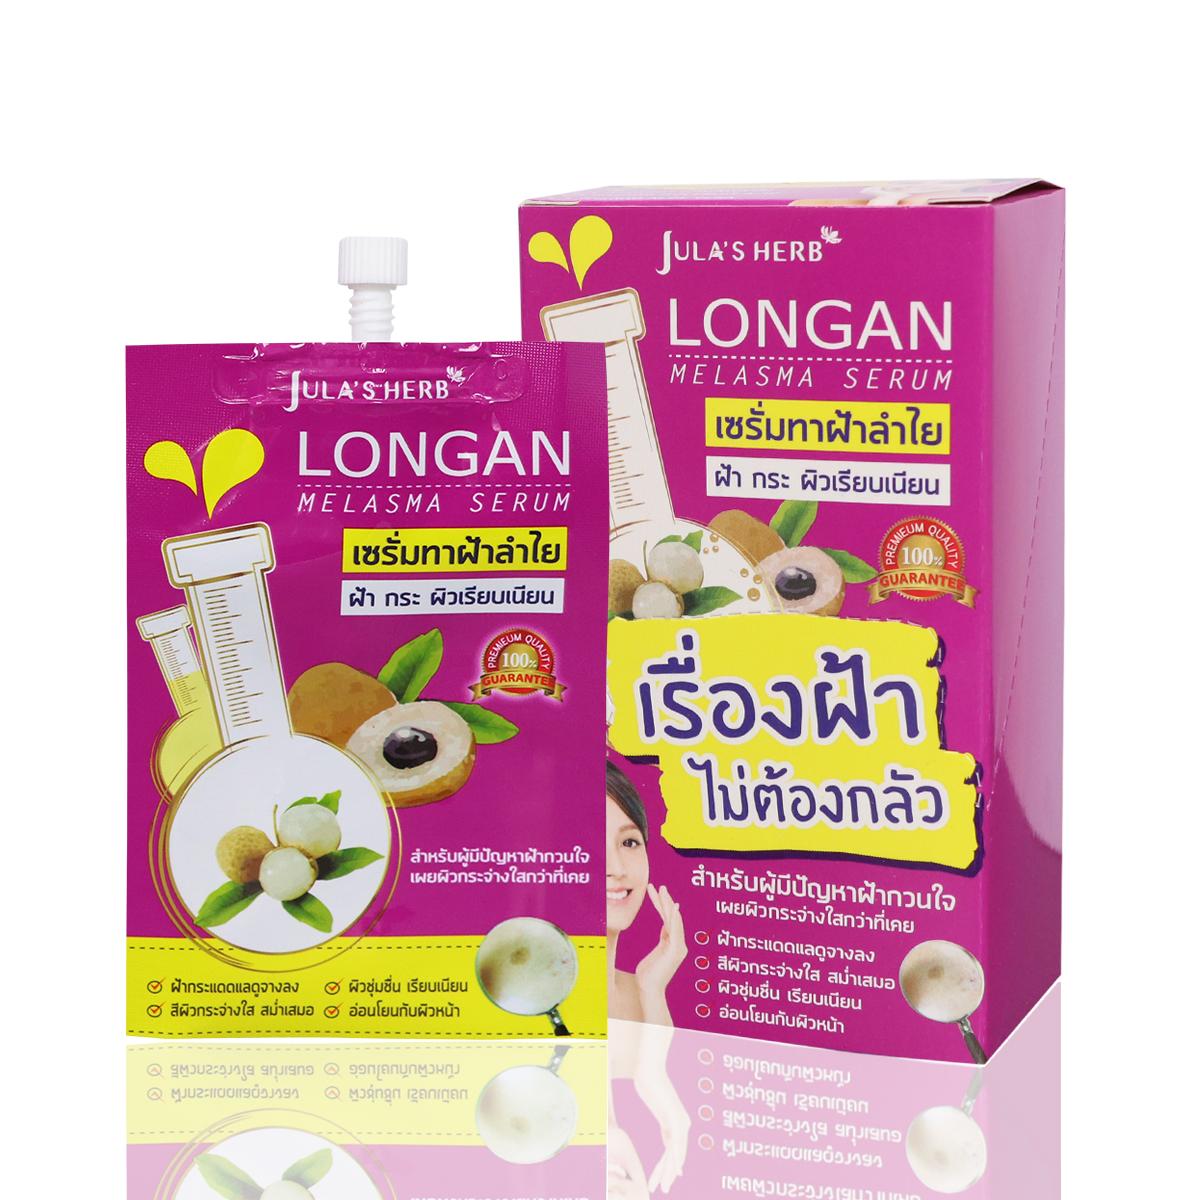 Longan Melasma Serum เซรั่มลำไยลดฝ้า (6ซอง)